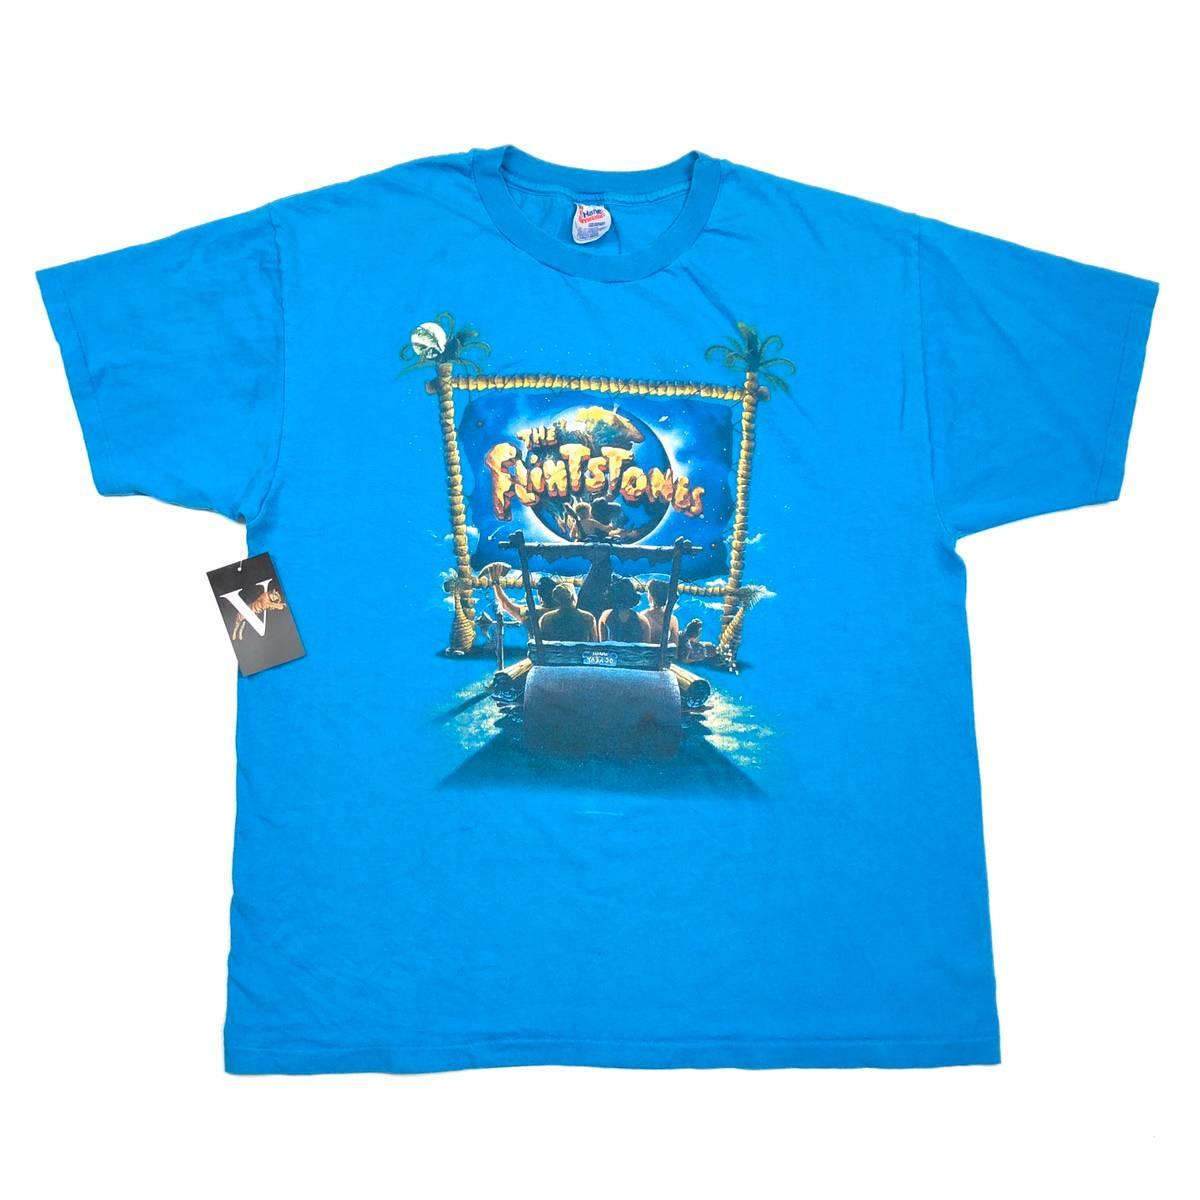 Vintage 2000 The Flintstones Cartoon Movie Promo Graphic T Shirt Size XL